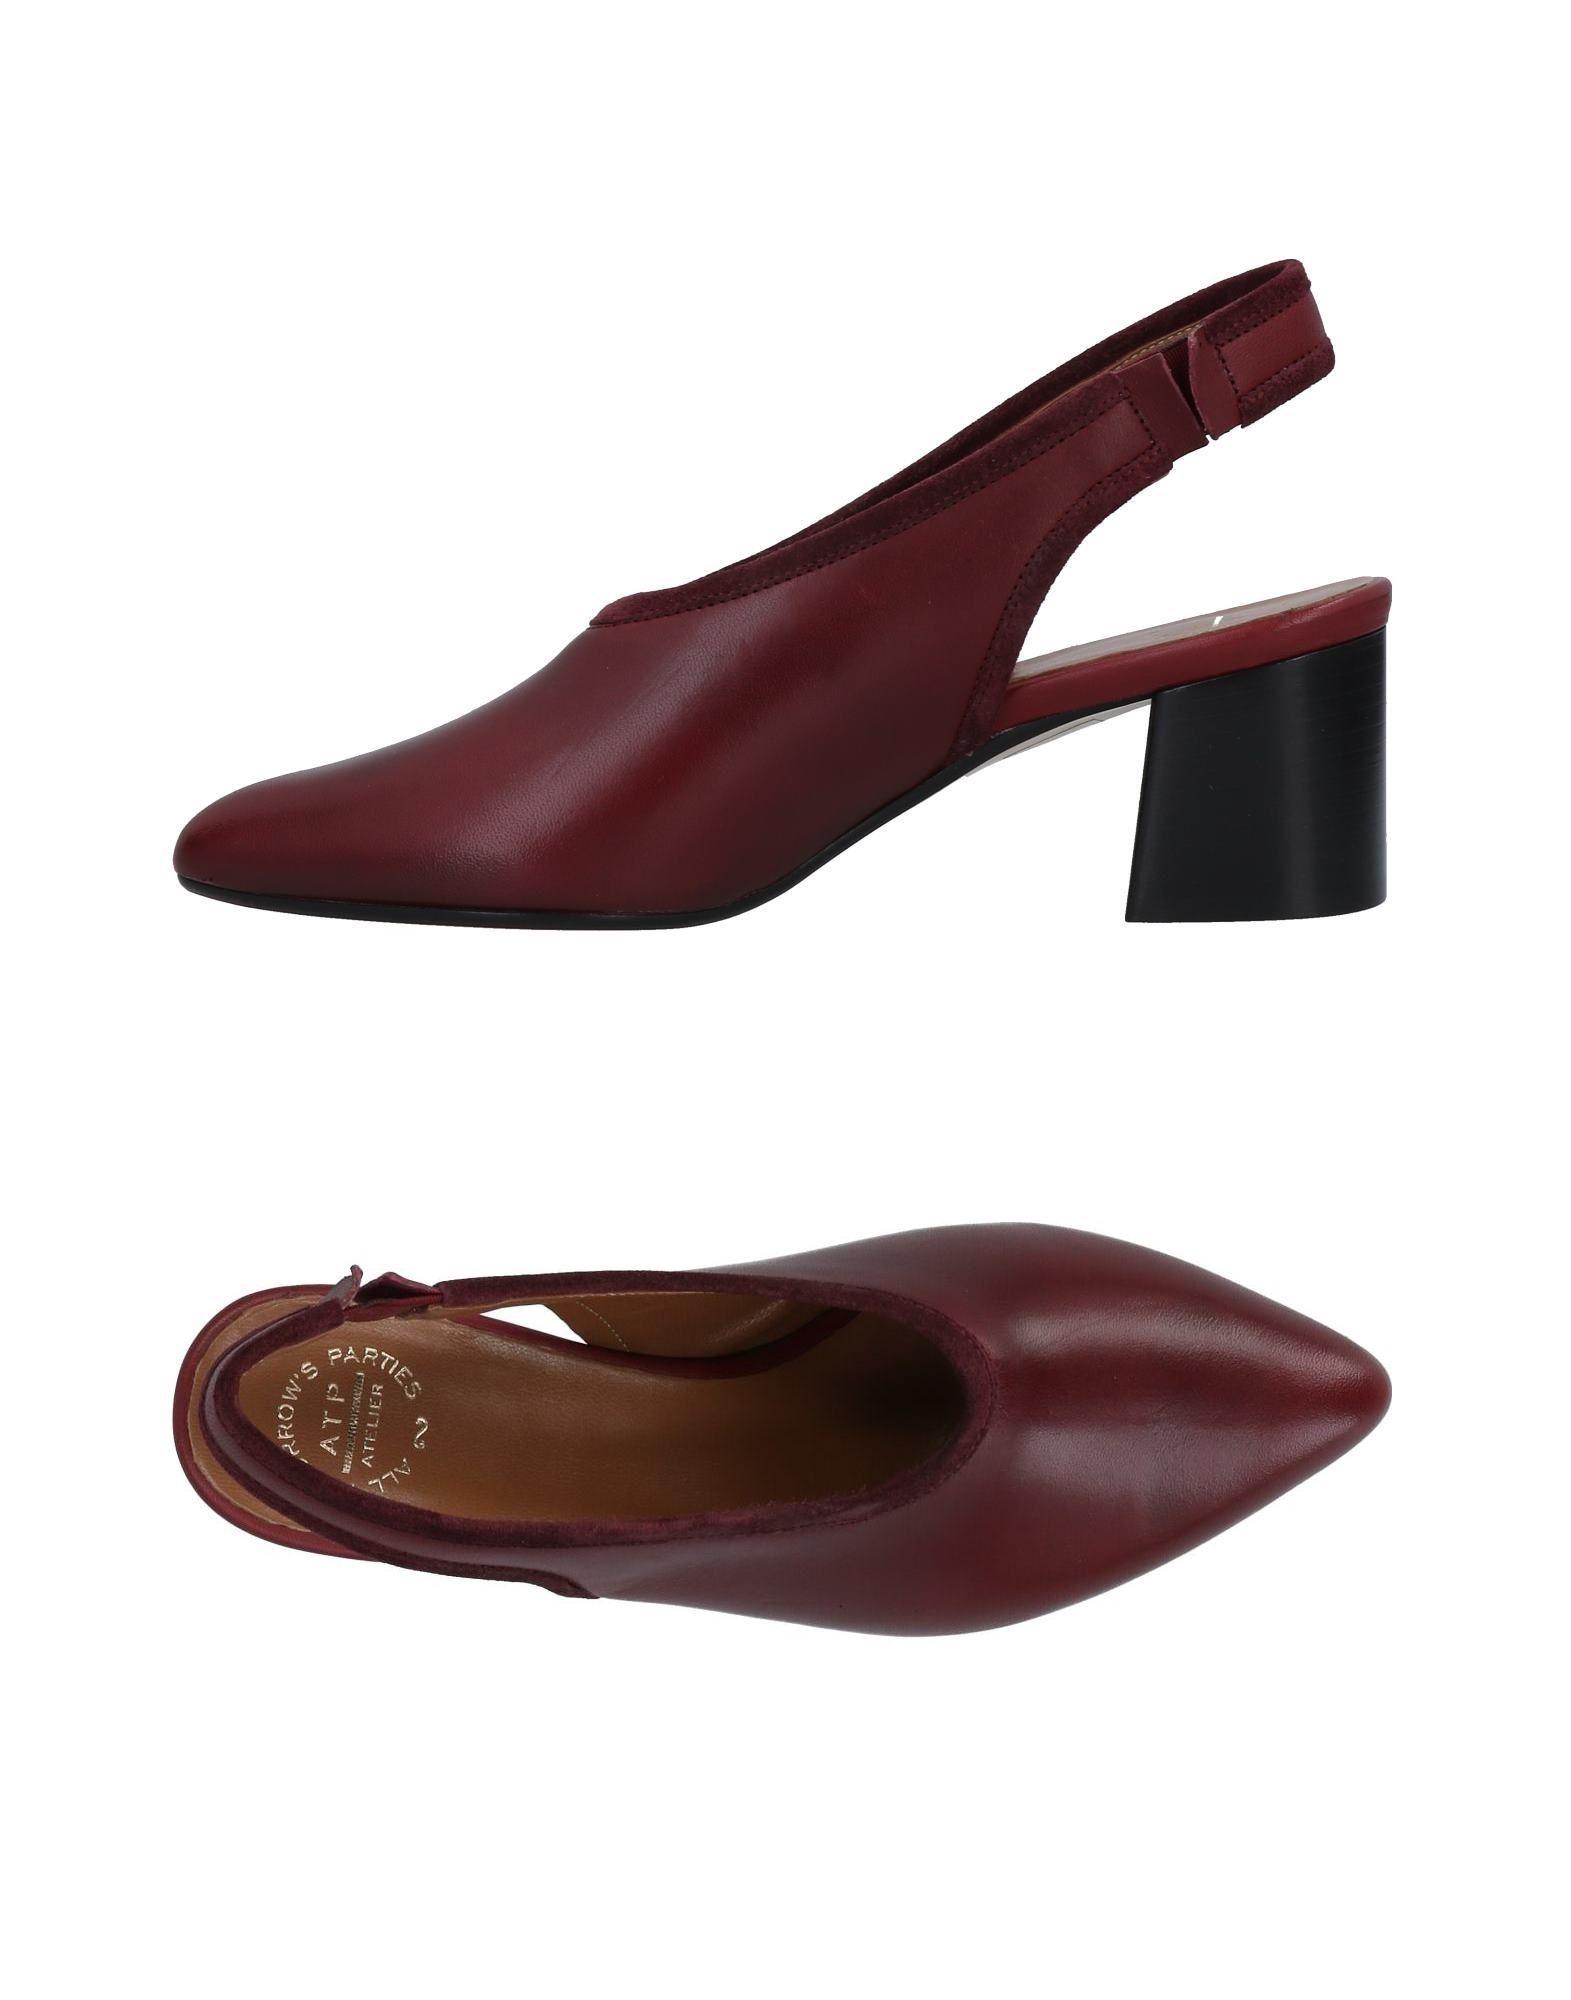 Stilvolle billige Schuhe Damen Atp Atelier Pumps Damen Schuhe  11493071NE f21355